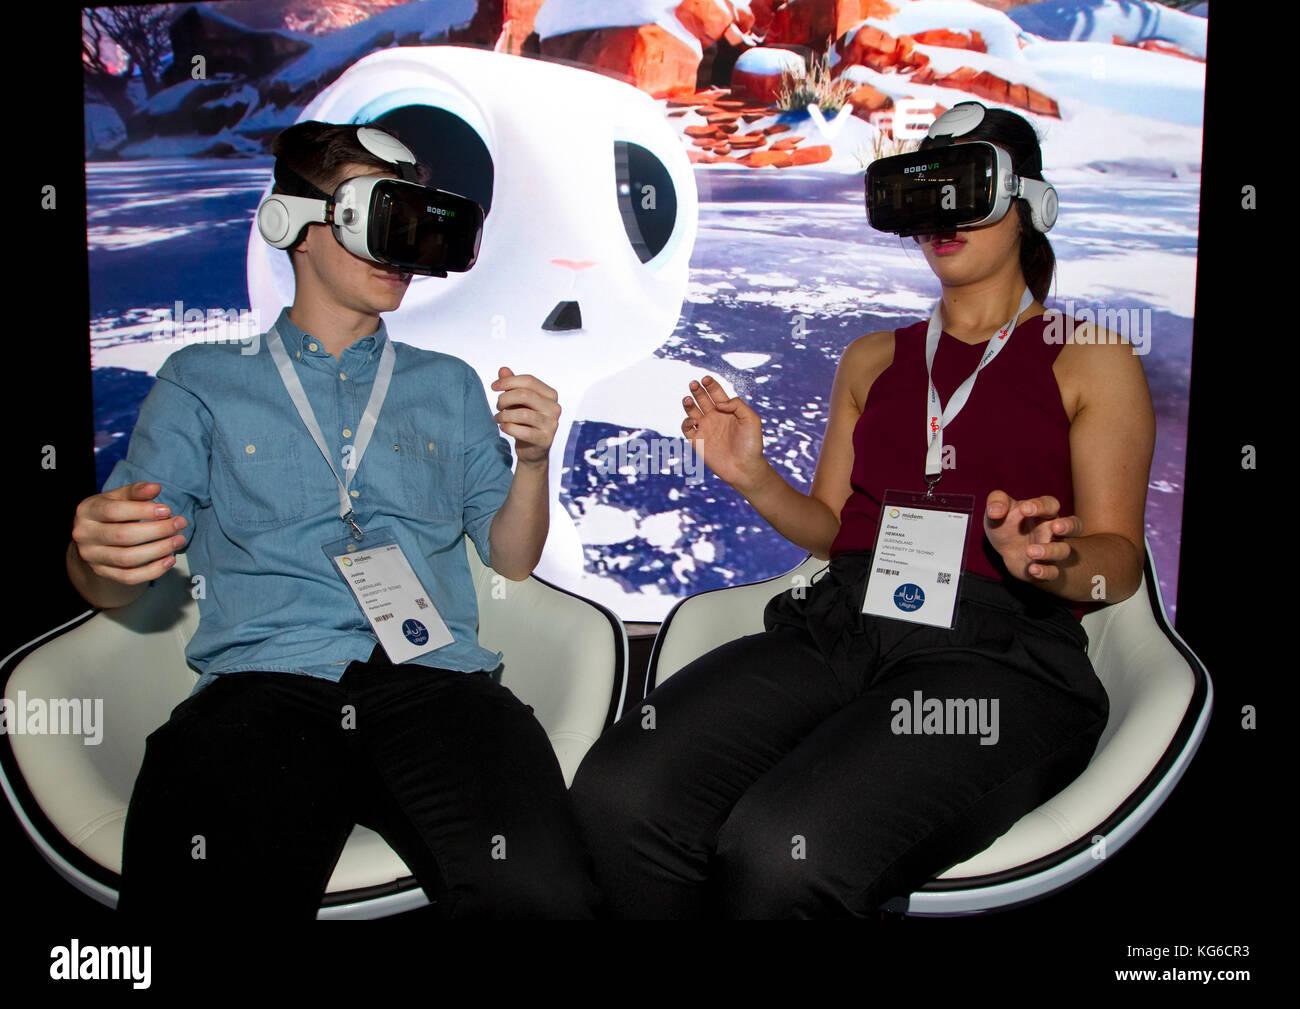 Cannes, France - June 07, 2017: Midem, the International B2B music market, VRTigo Stand Presentation with VR Virtual Reality Stock Photo